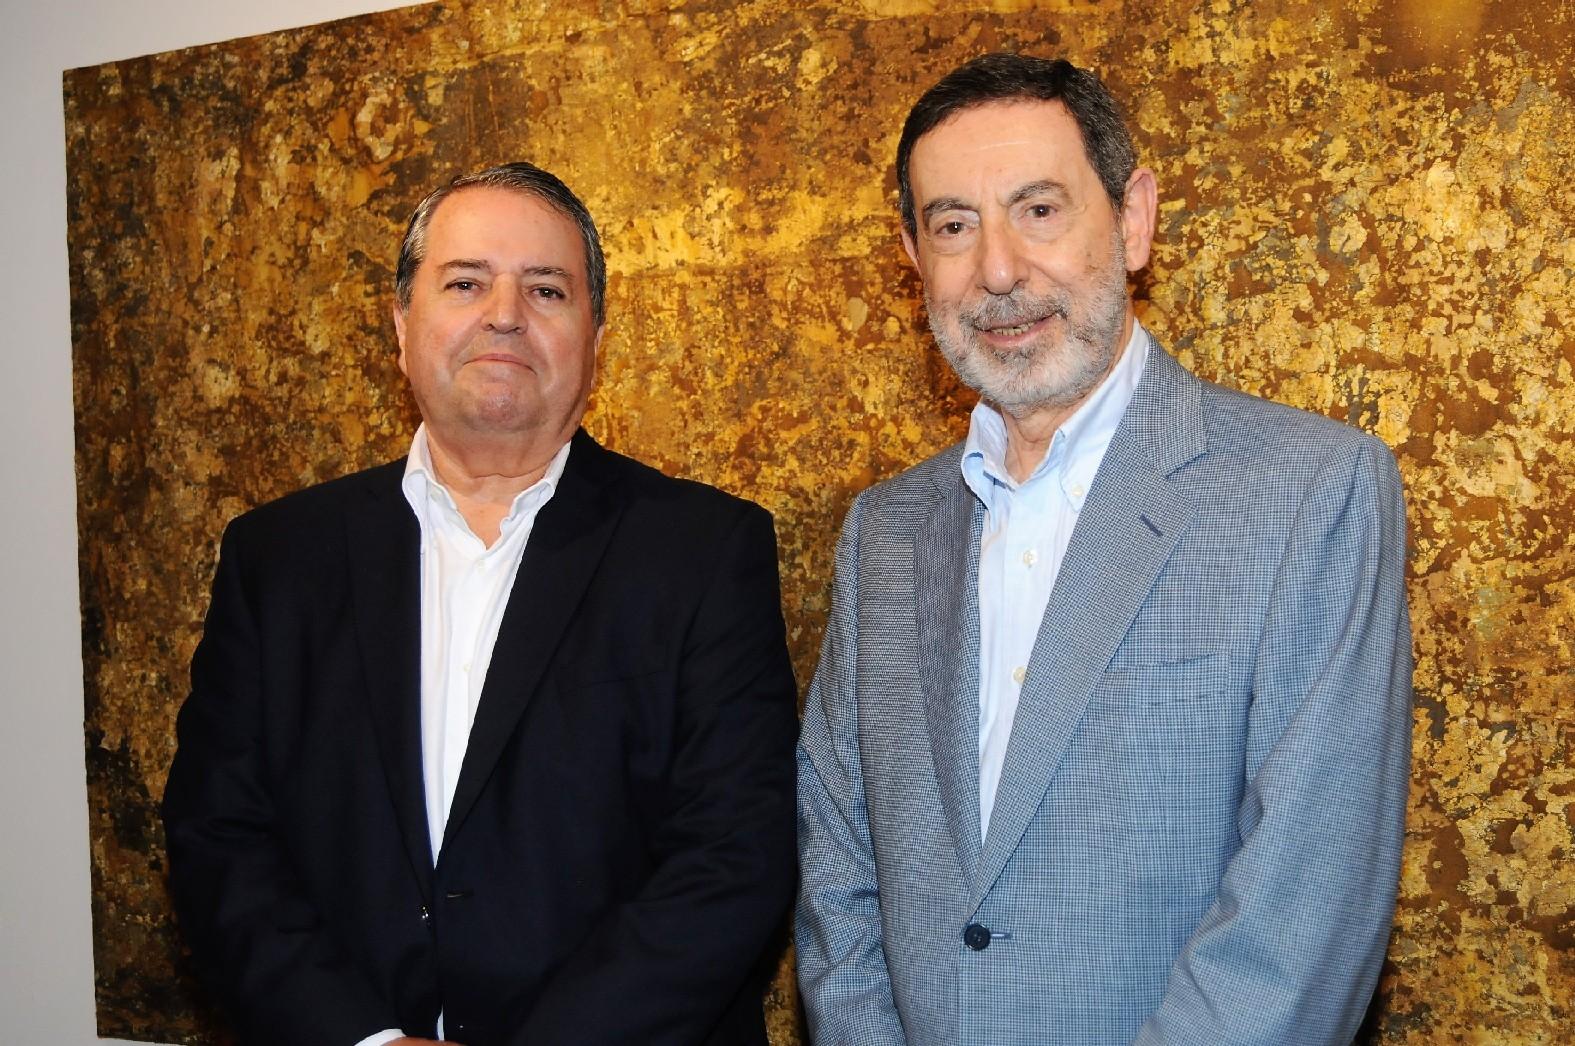 Stelio Amarante e Osmar Chohfi (1)